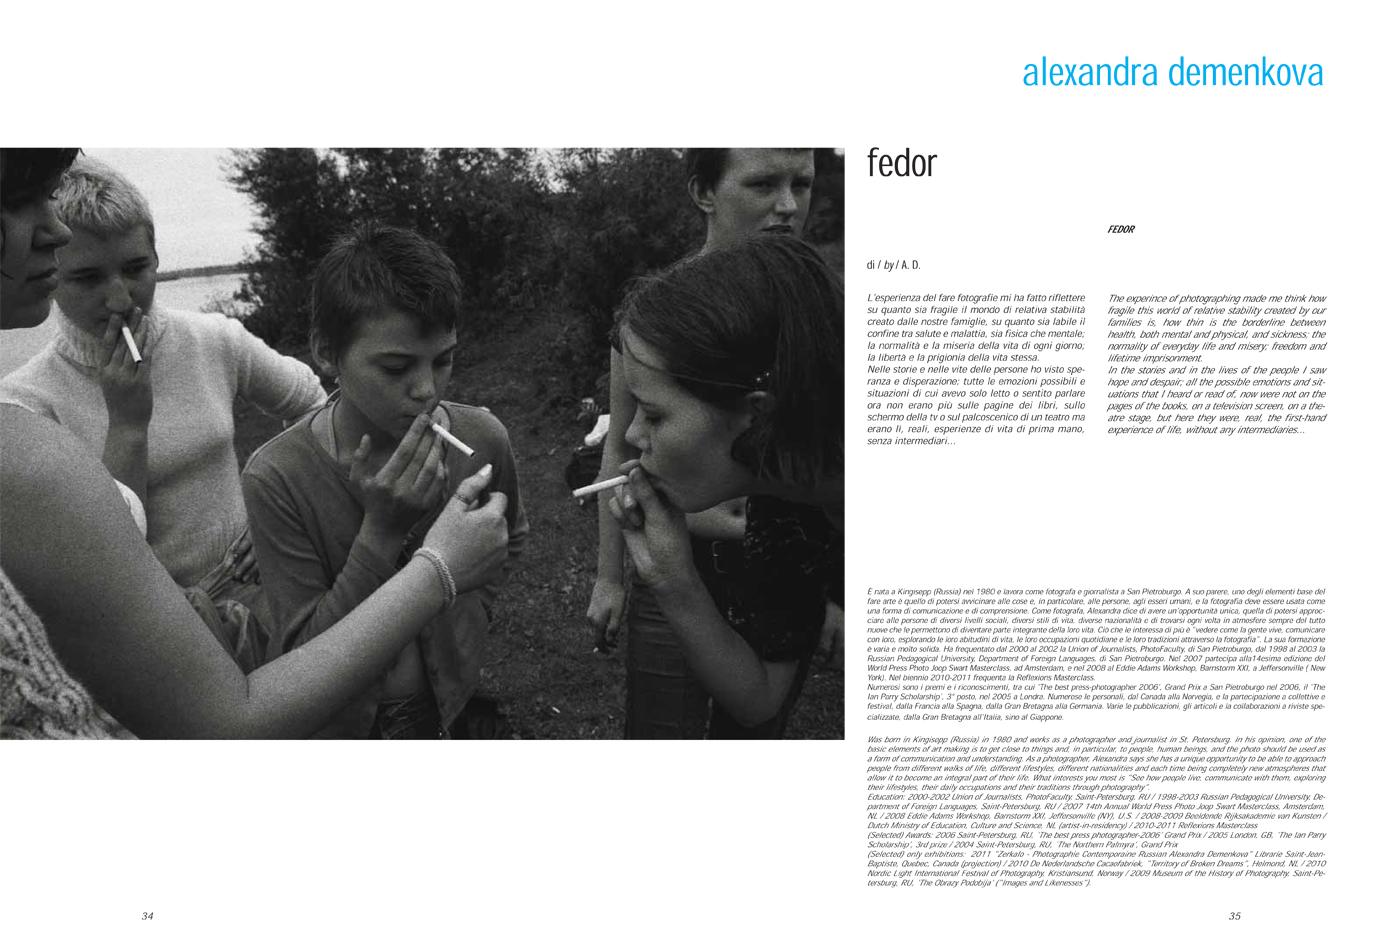 catalogo_menotrentuno_2011-18.jpg